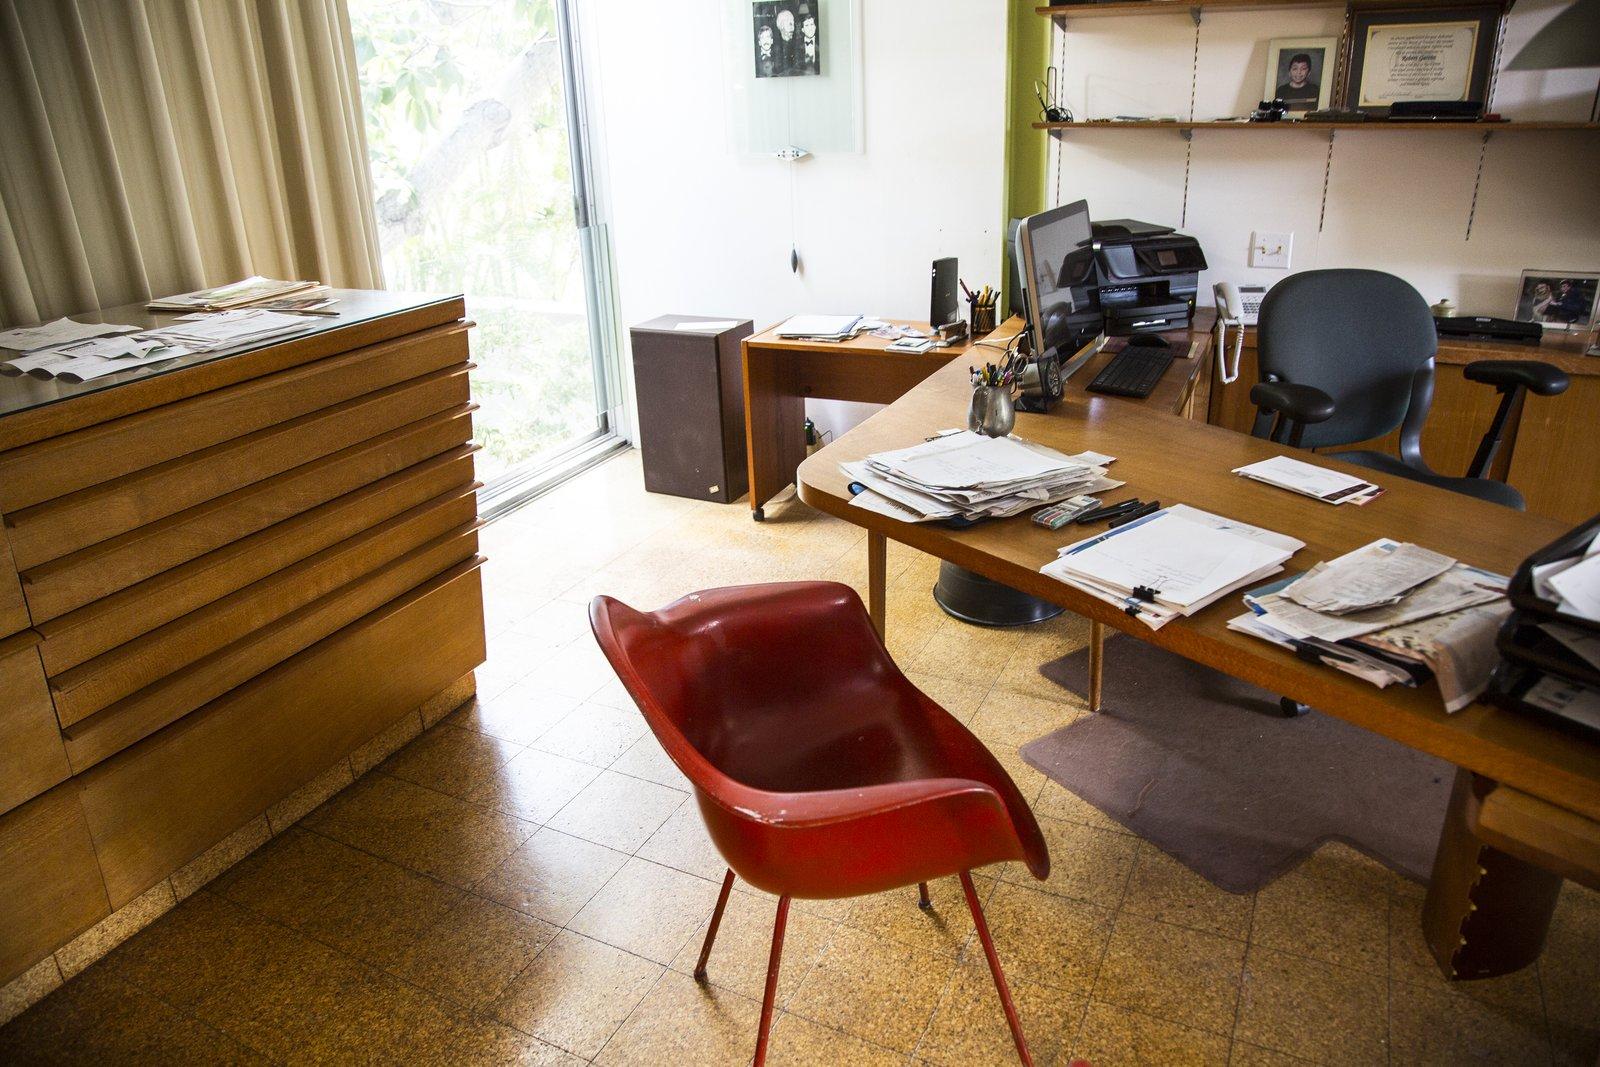 Office, Study Room Type, Chair, Bookcase, Storage, Shelves, Cork Floor, and Desk  Hiss Studio